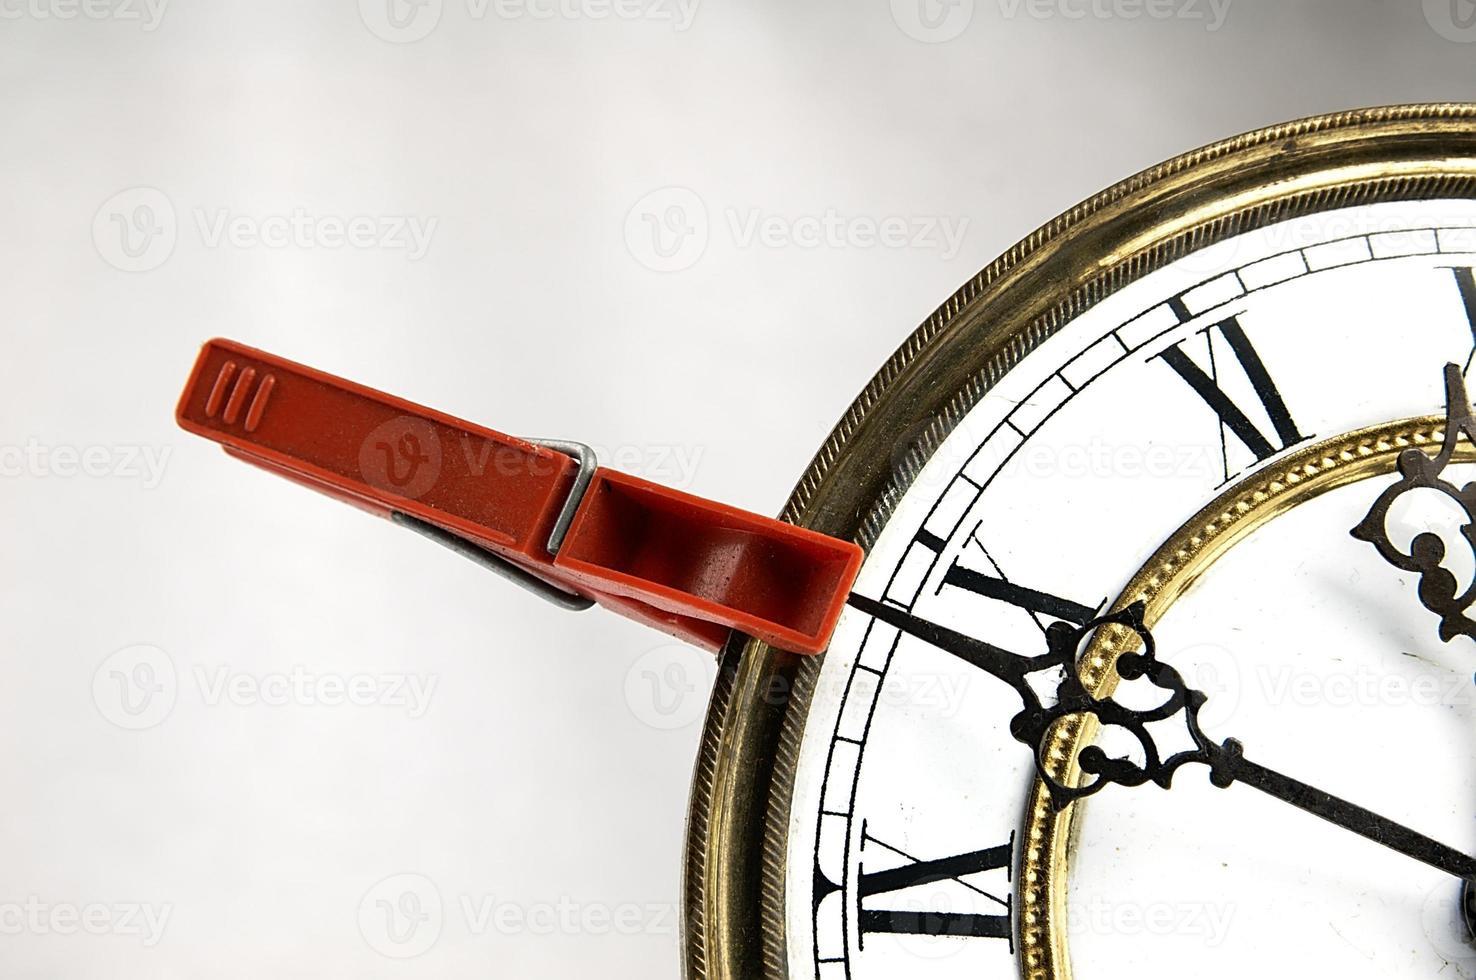 prendedor de roupa parar o relógio foto